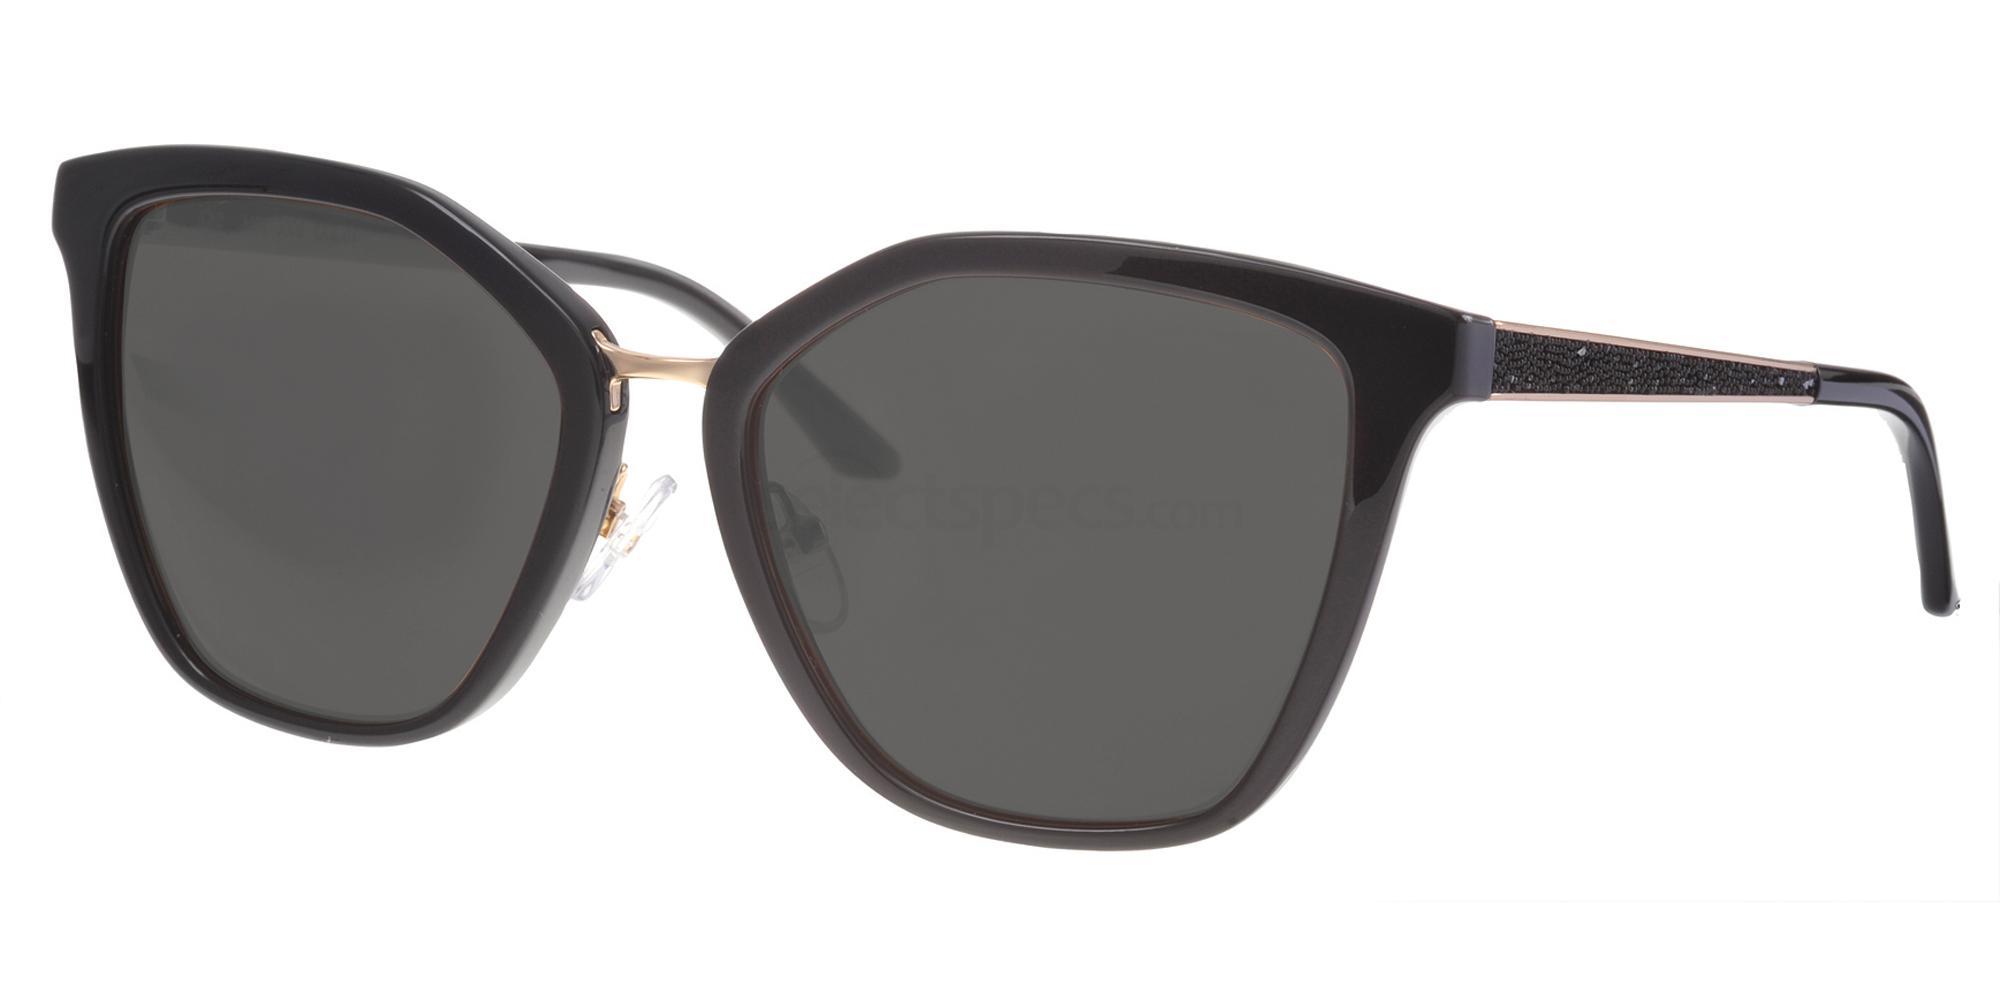 C01 3009 Sunglasses, Joia